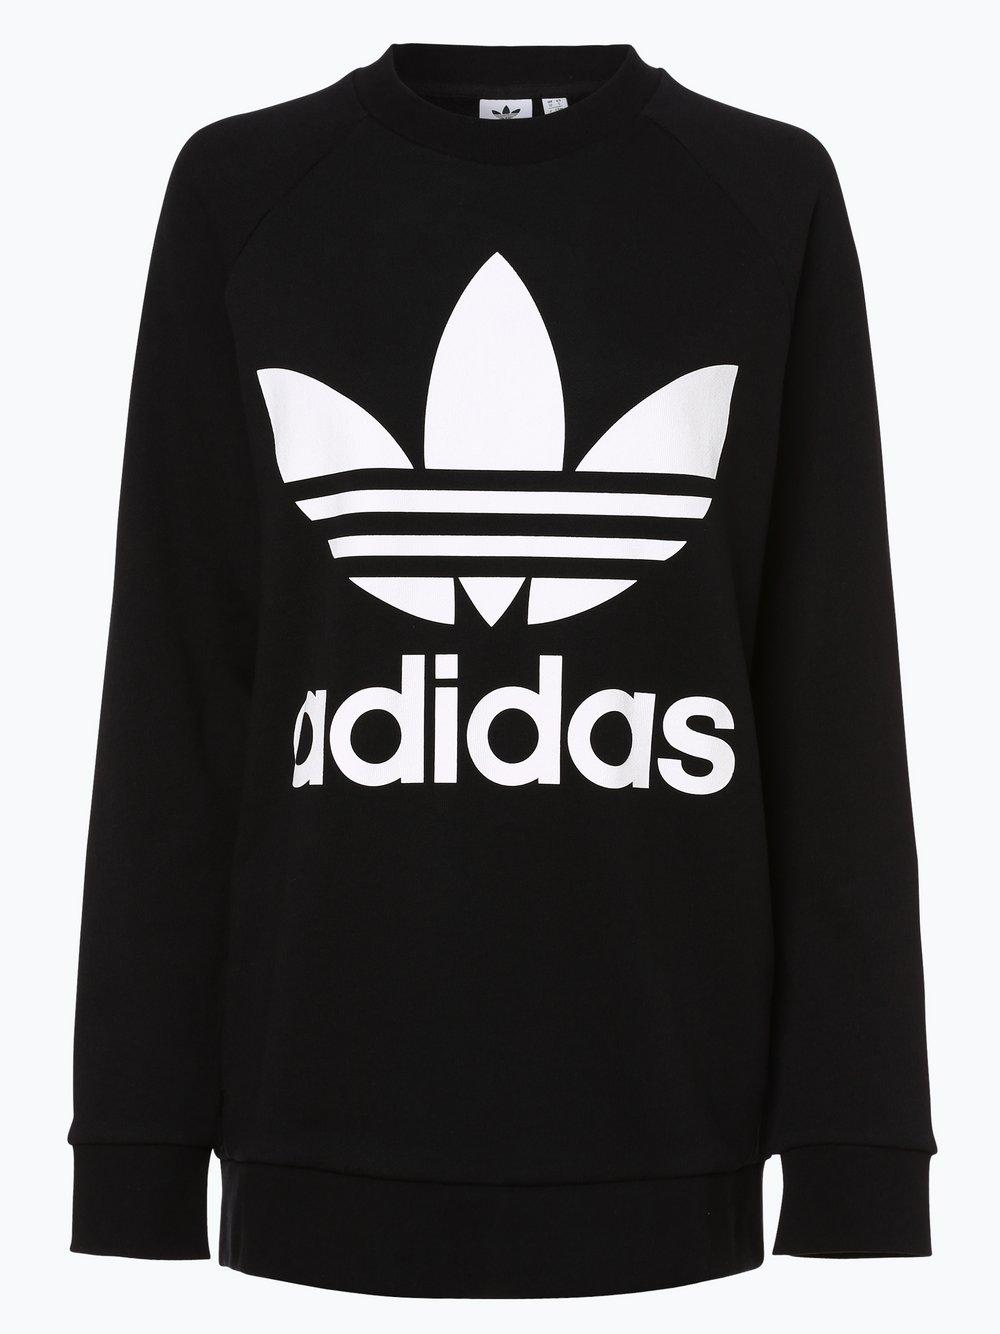 f1ed949756df73 adidas-originals-damen-sweatshirt_pdmain_412987-0001_bustfront_1.jpg